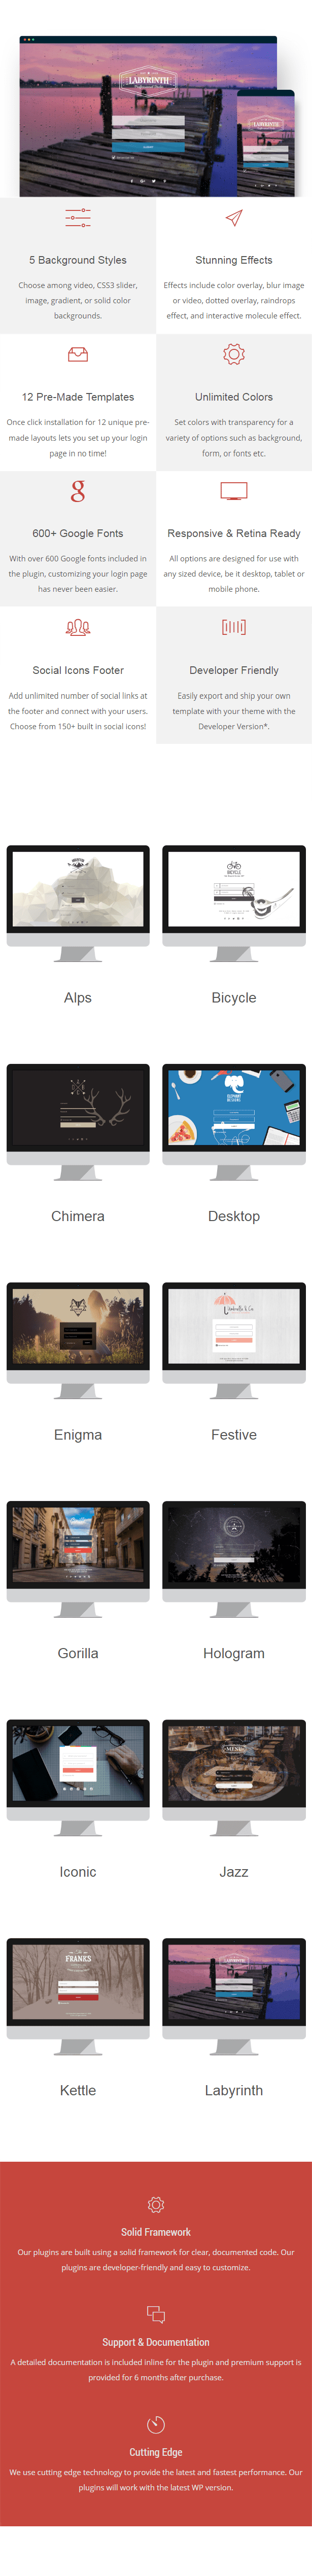 Loginstyle - WordPress Login Page Styler - 1